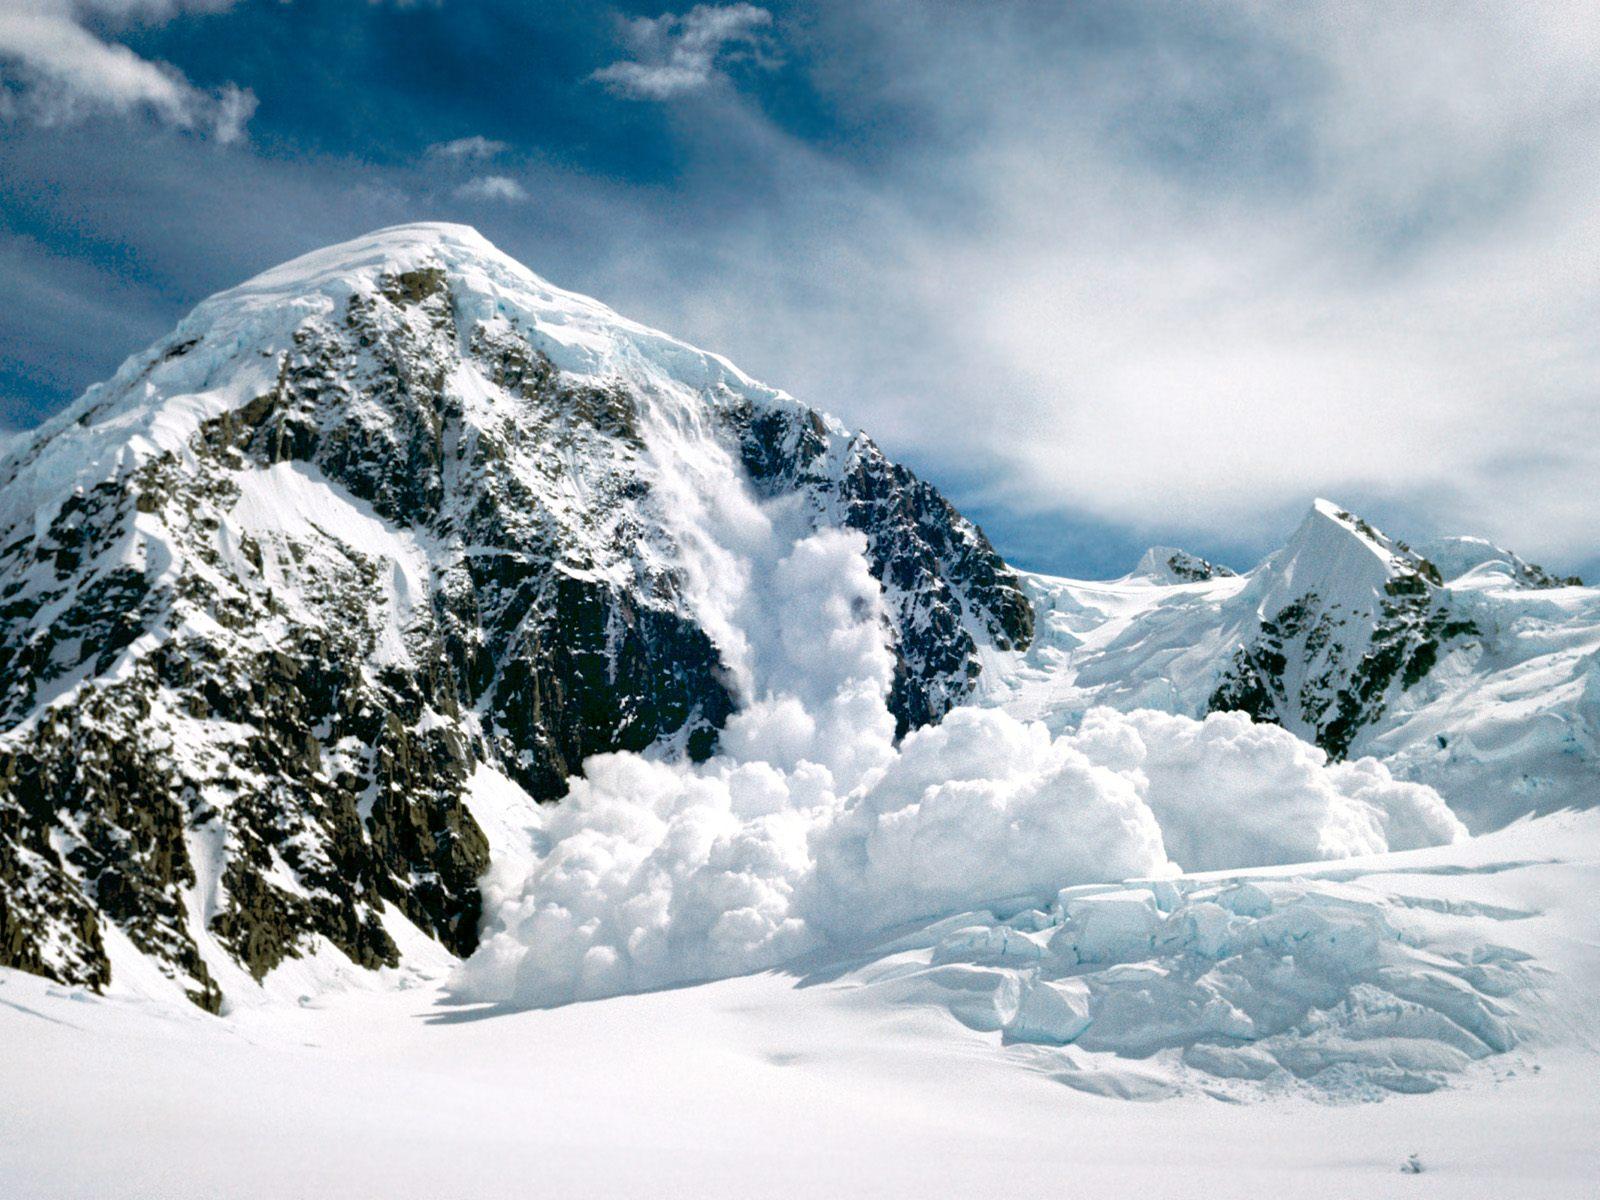 Shod laviny